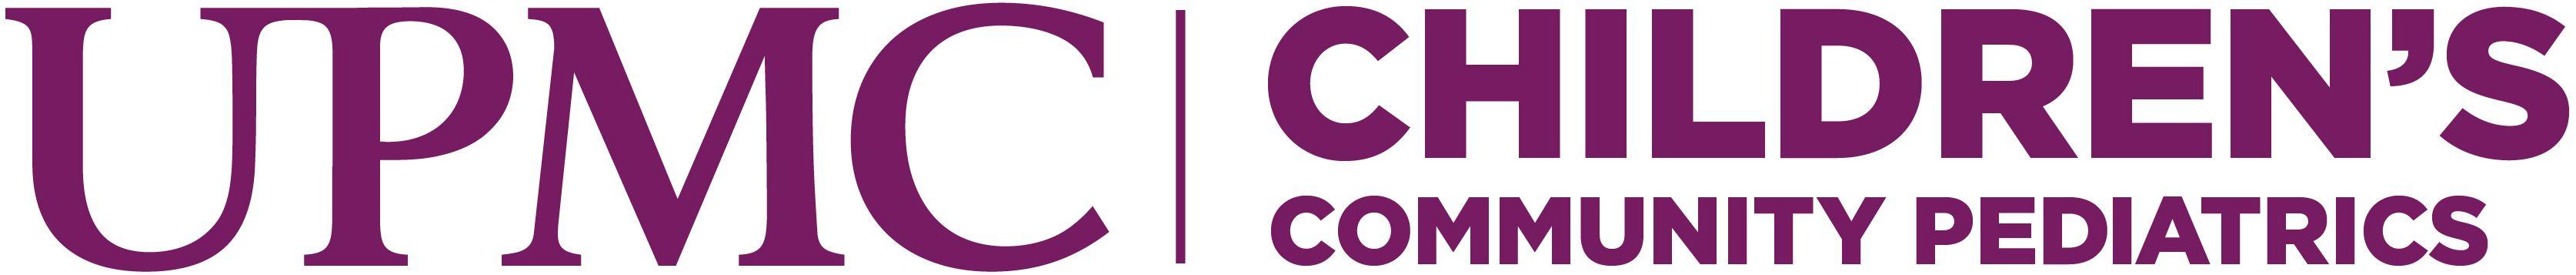 UPMC Children's Community Pediatrics Logo